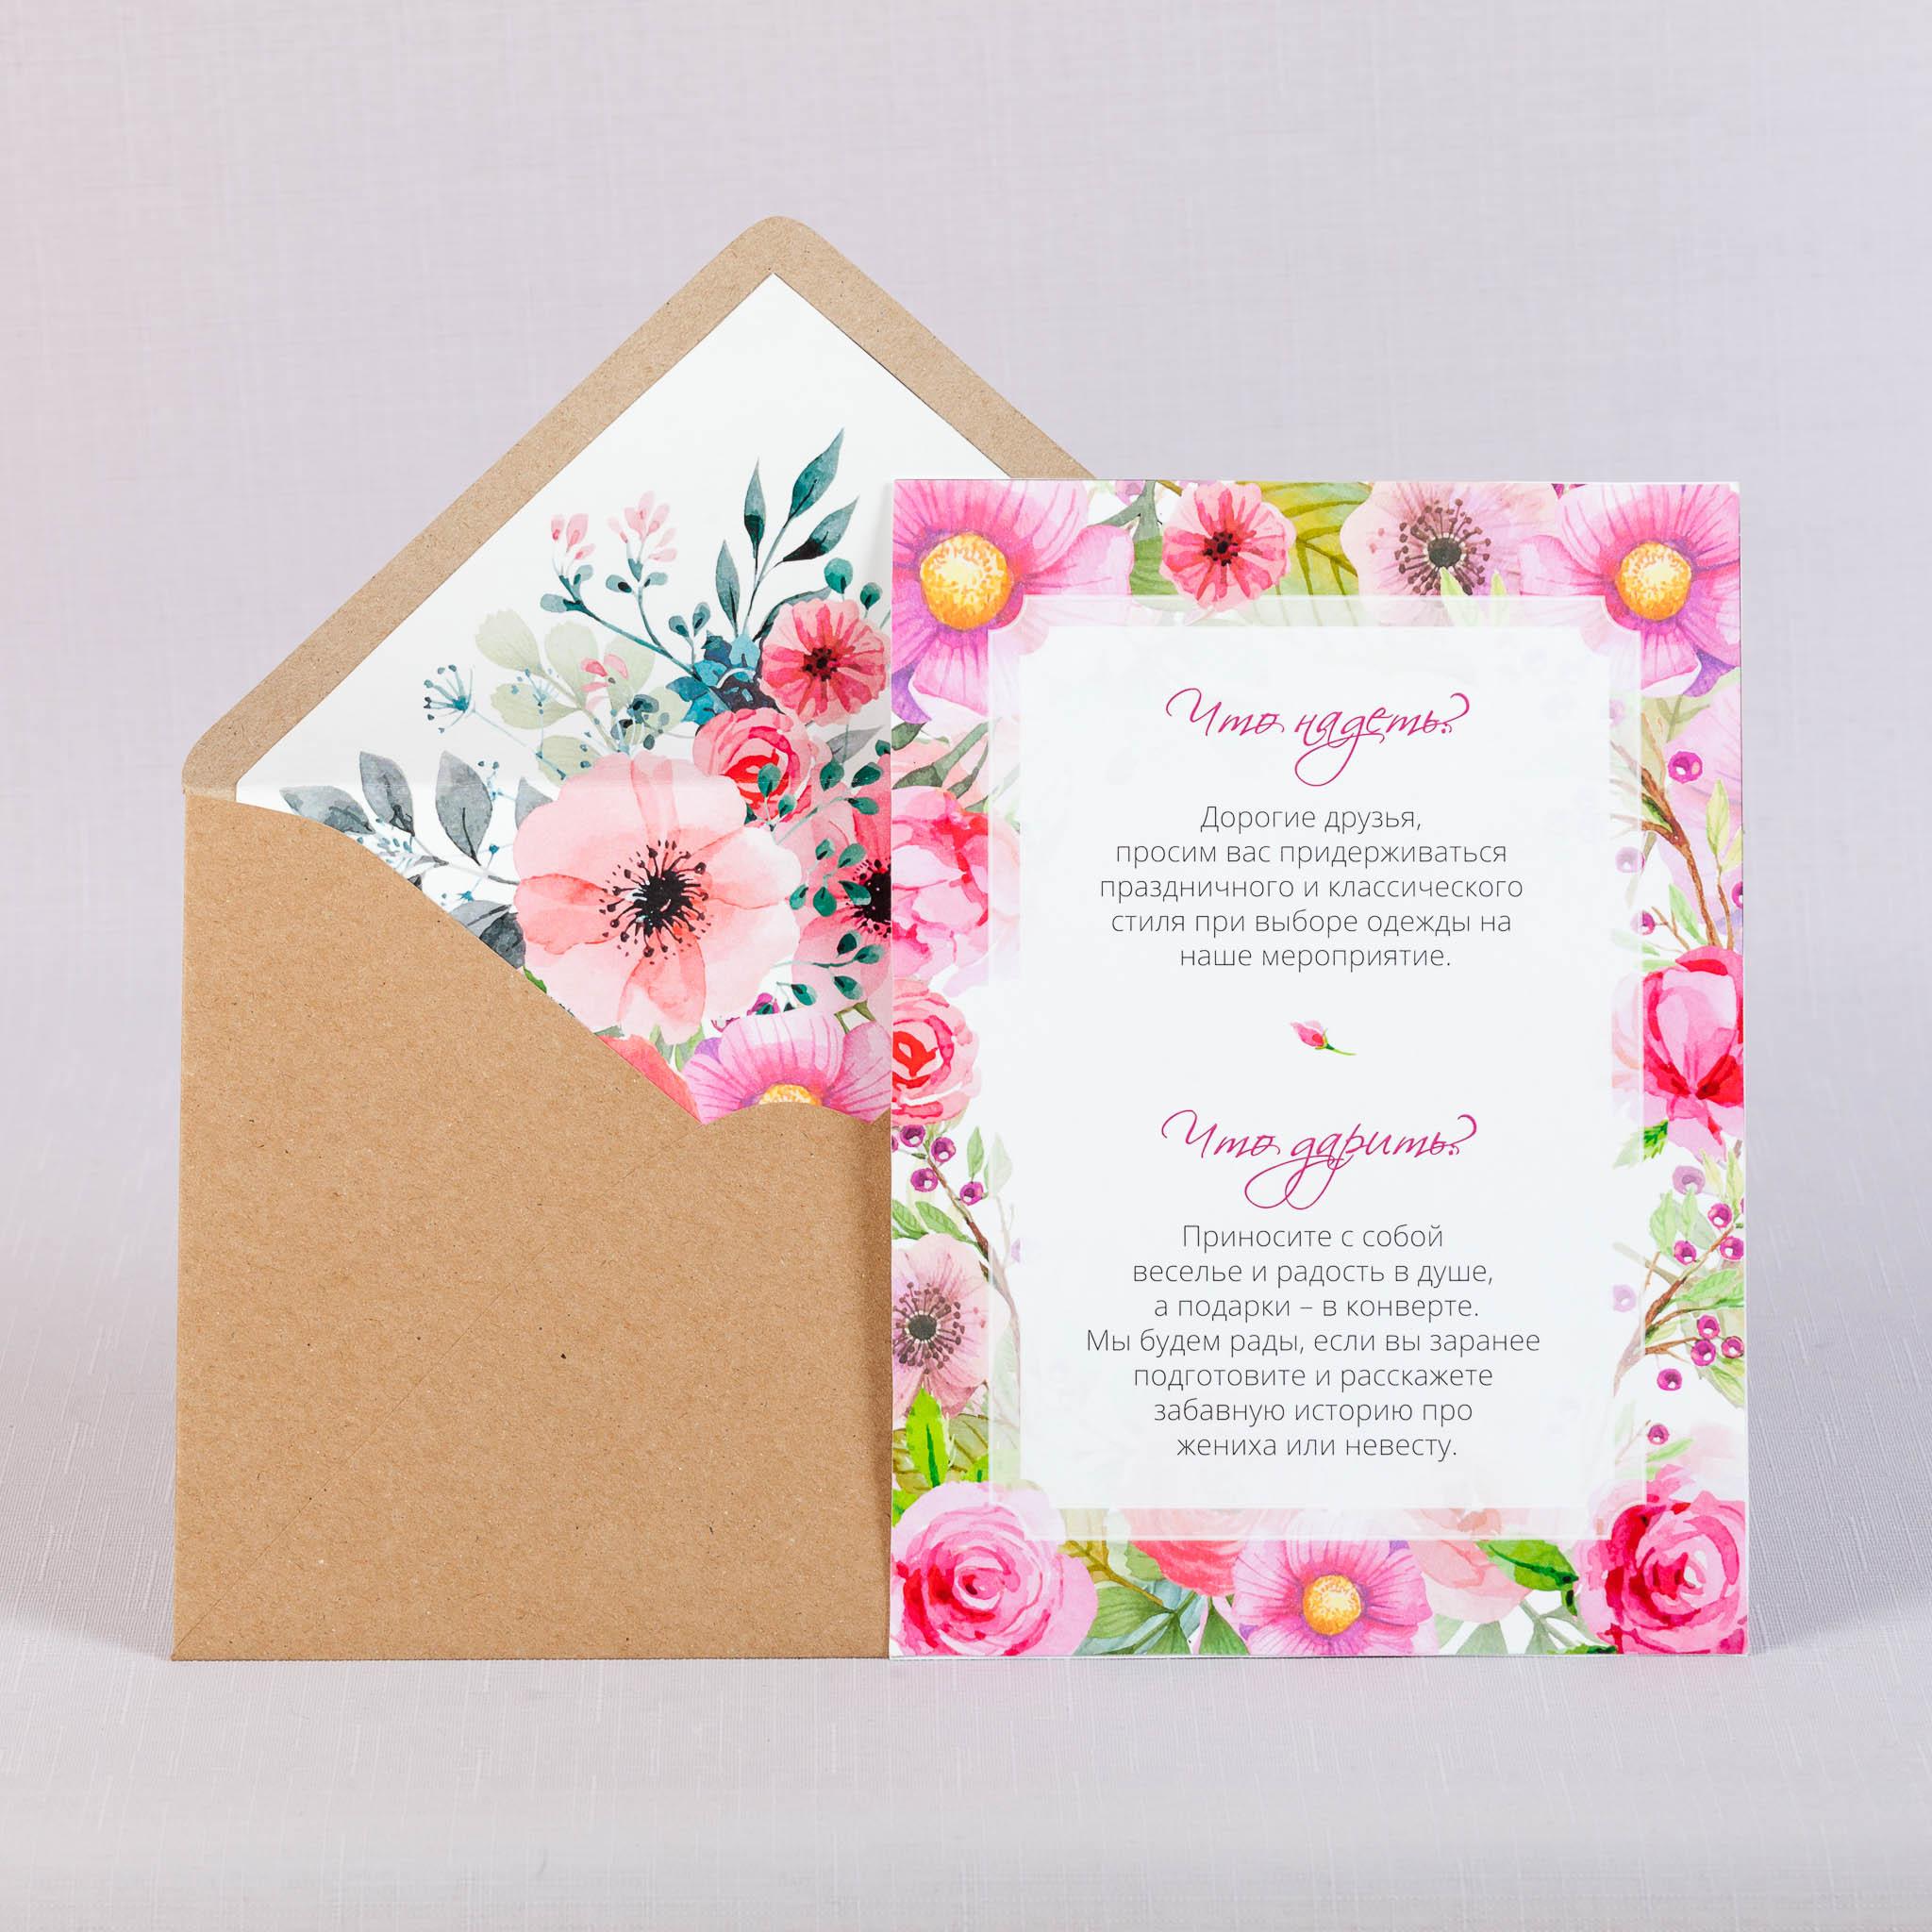 https://www.infolio-print.ru/images/products_gallery_images/K-132_wedding_rose_flowers.JPG